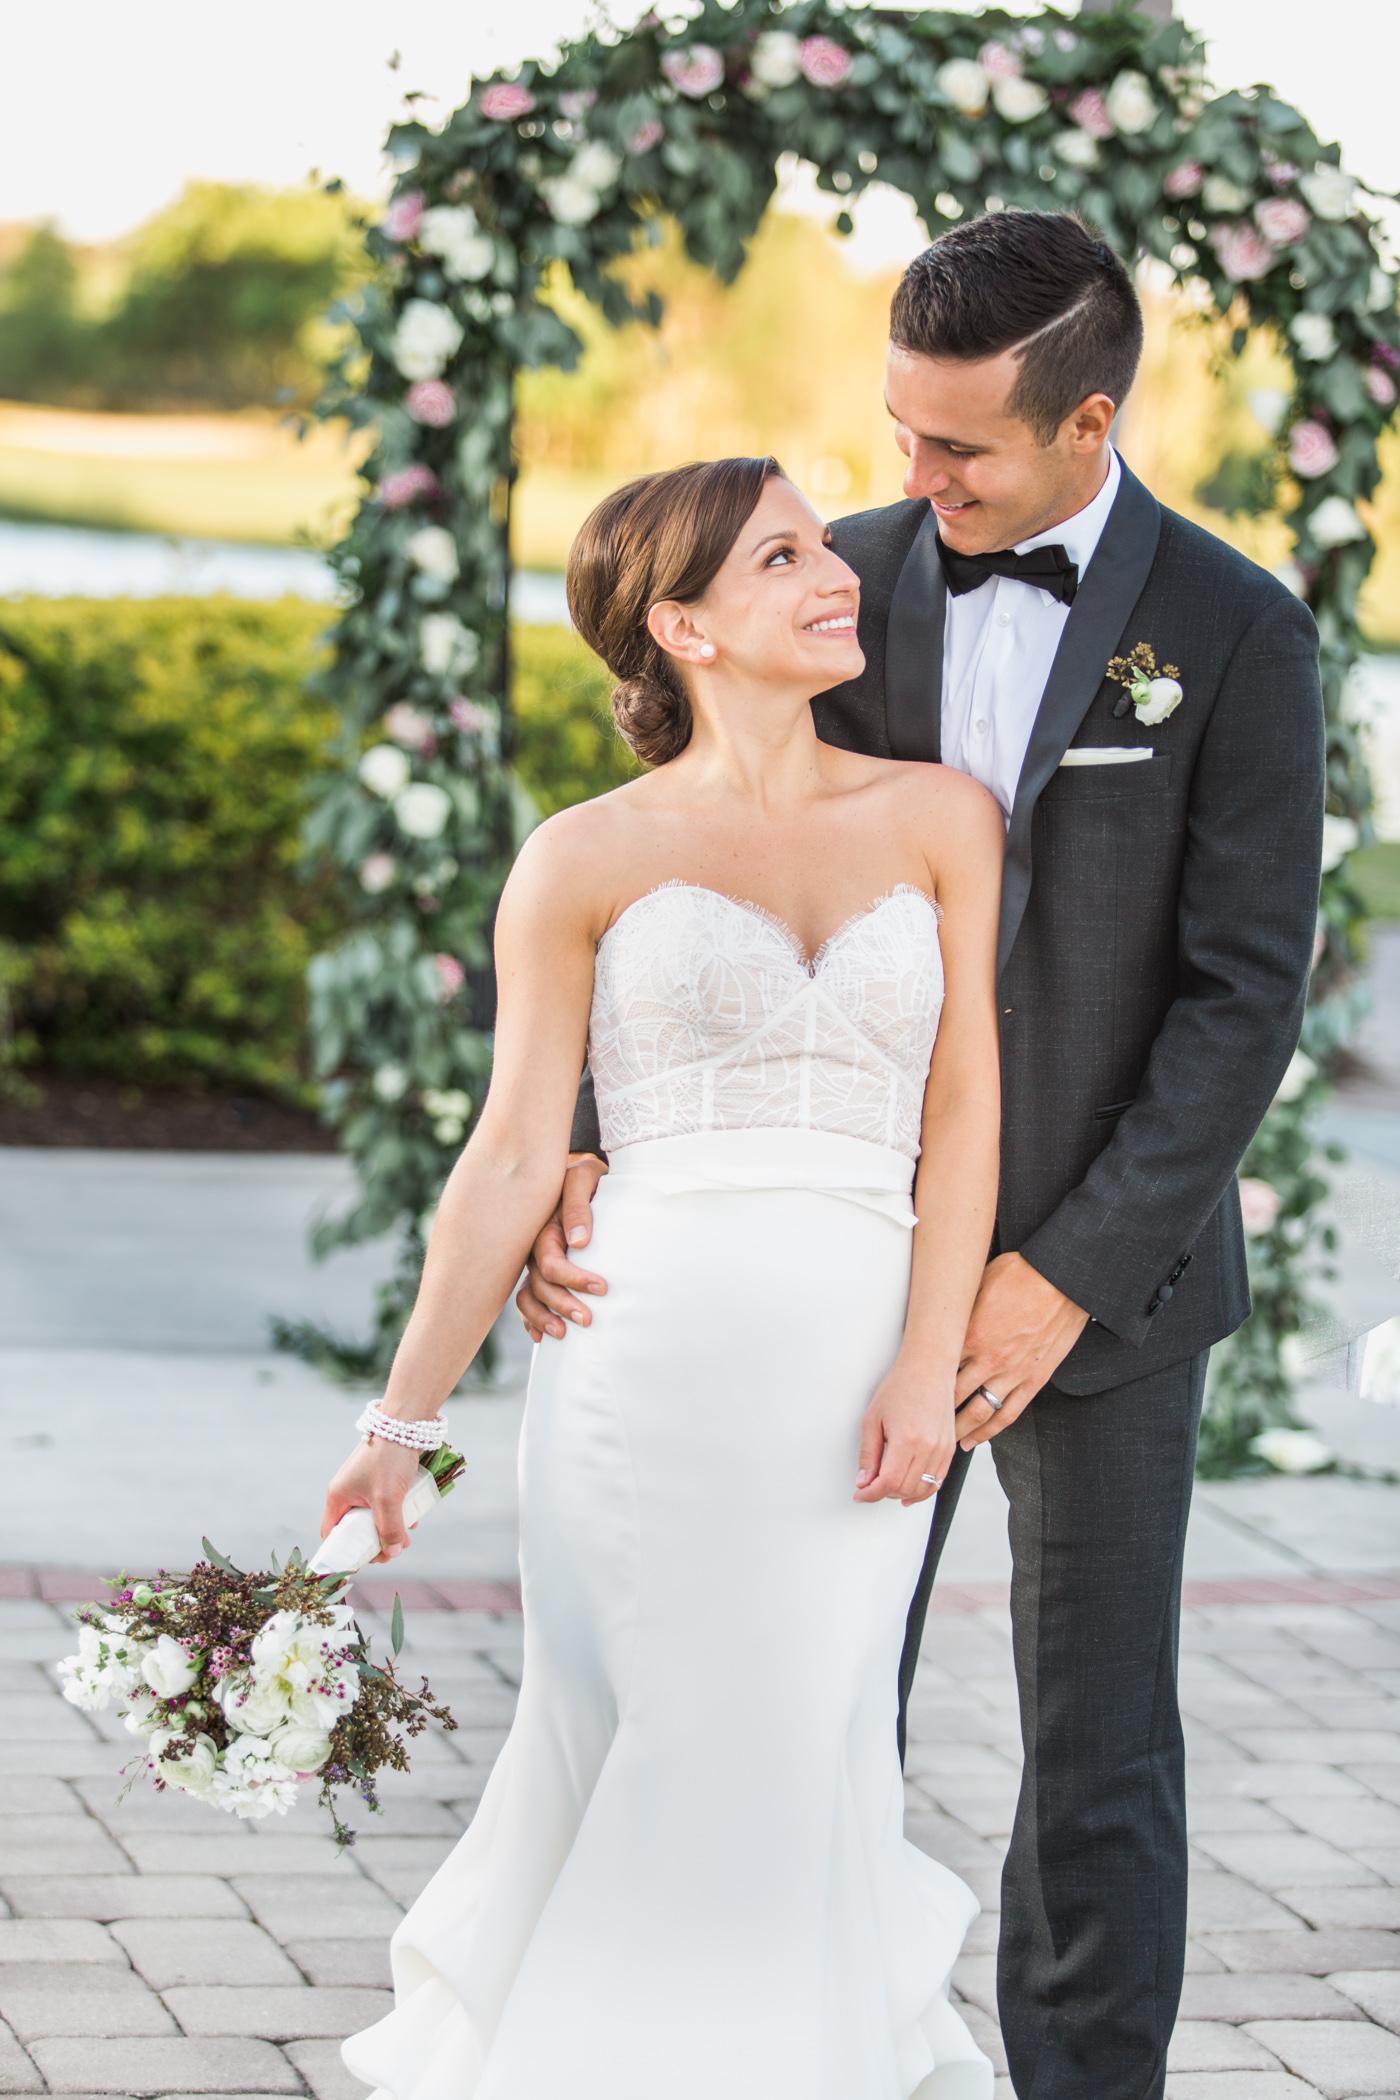 David & Allie - Shingle Creek Wedding Sneak Peek Spring 2016 - Web 17.jpg